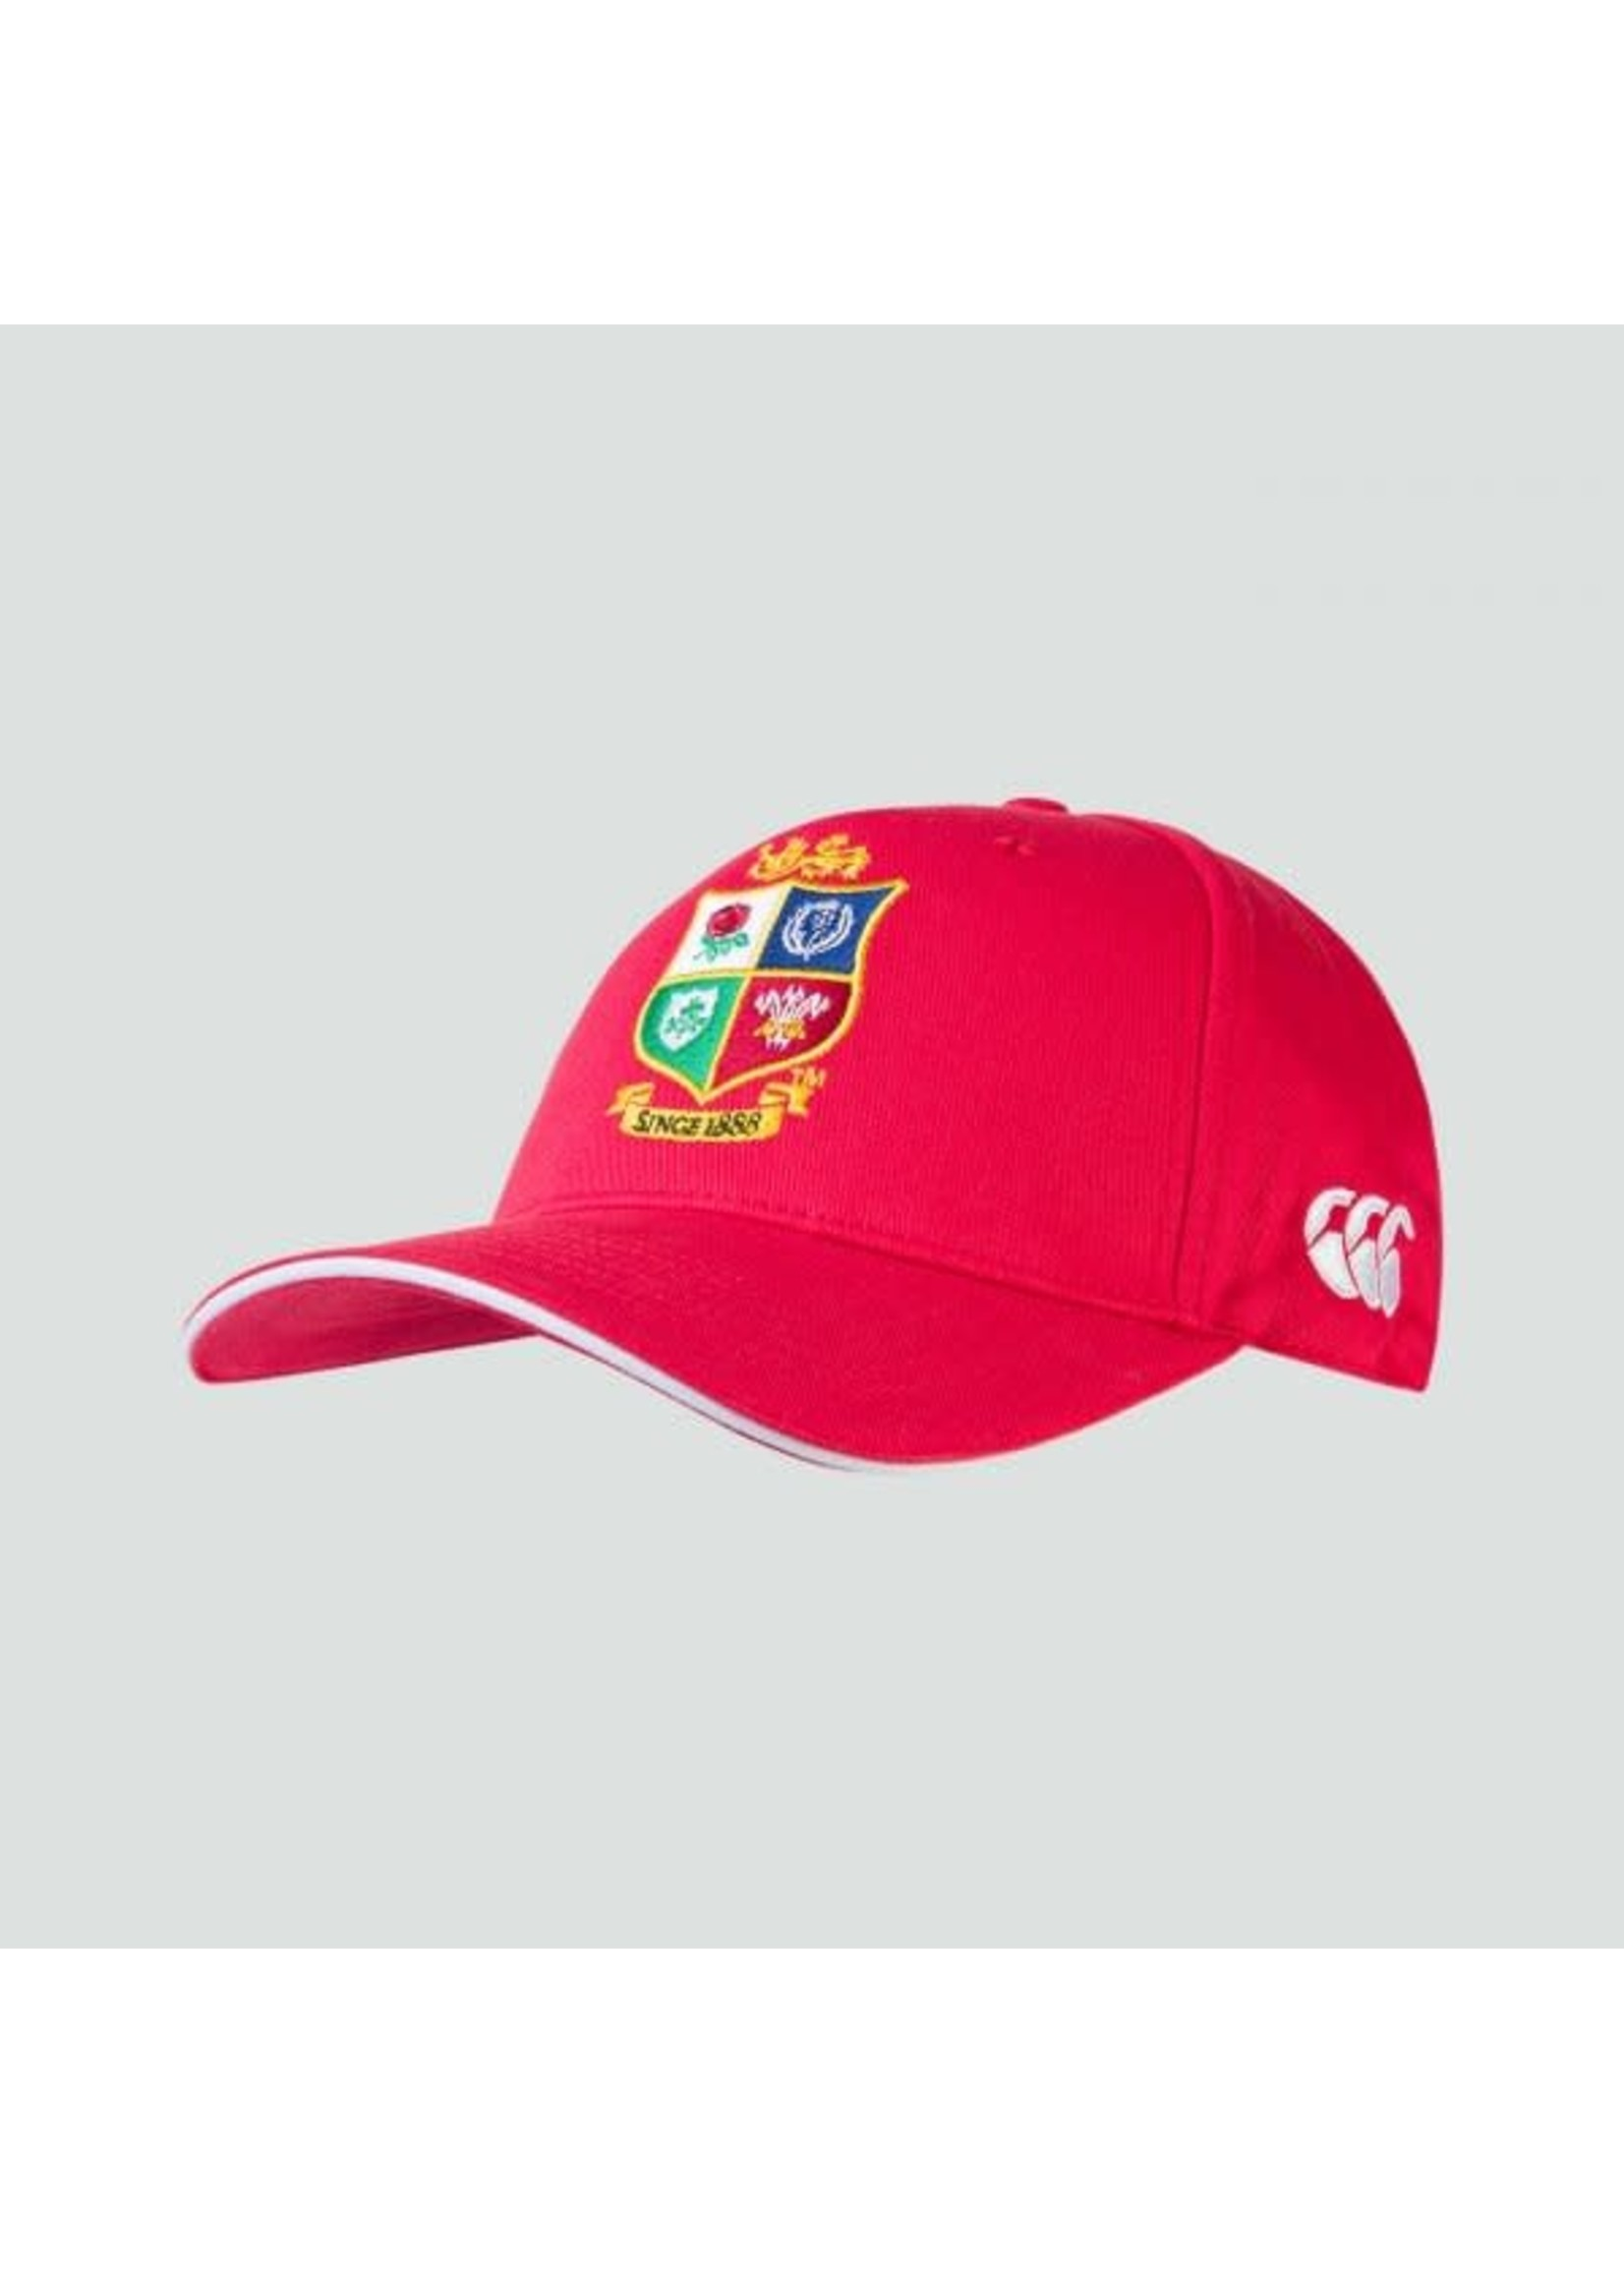 Canterbury British & Irish Lions Cotton Drill Cap, Red